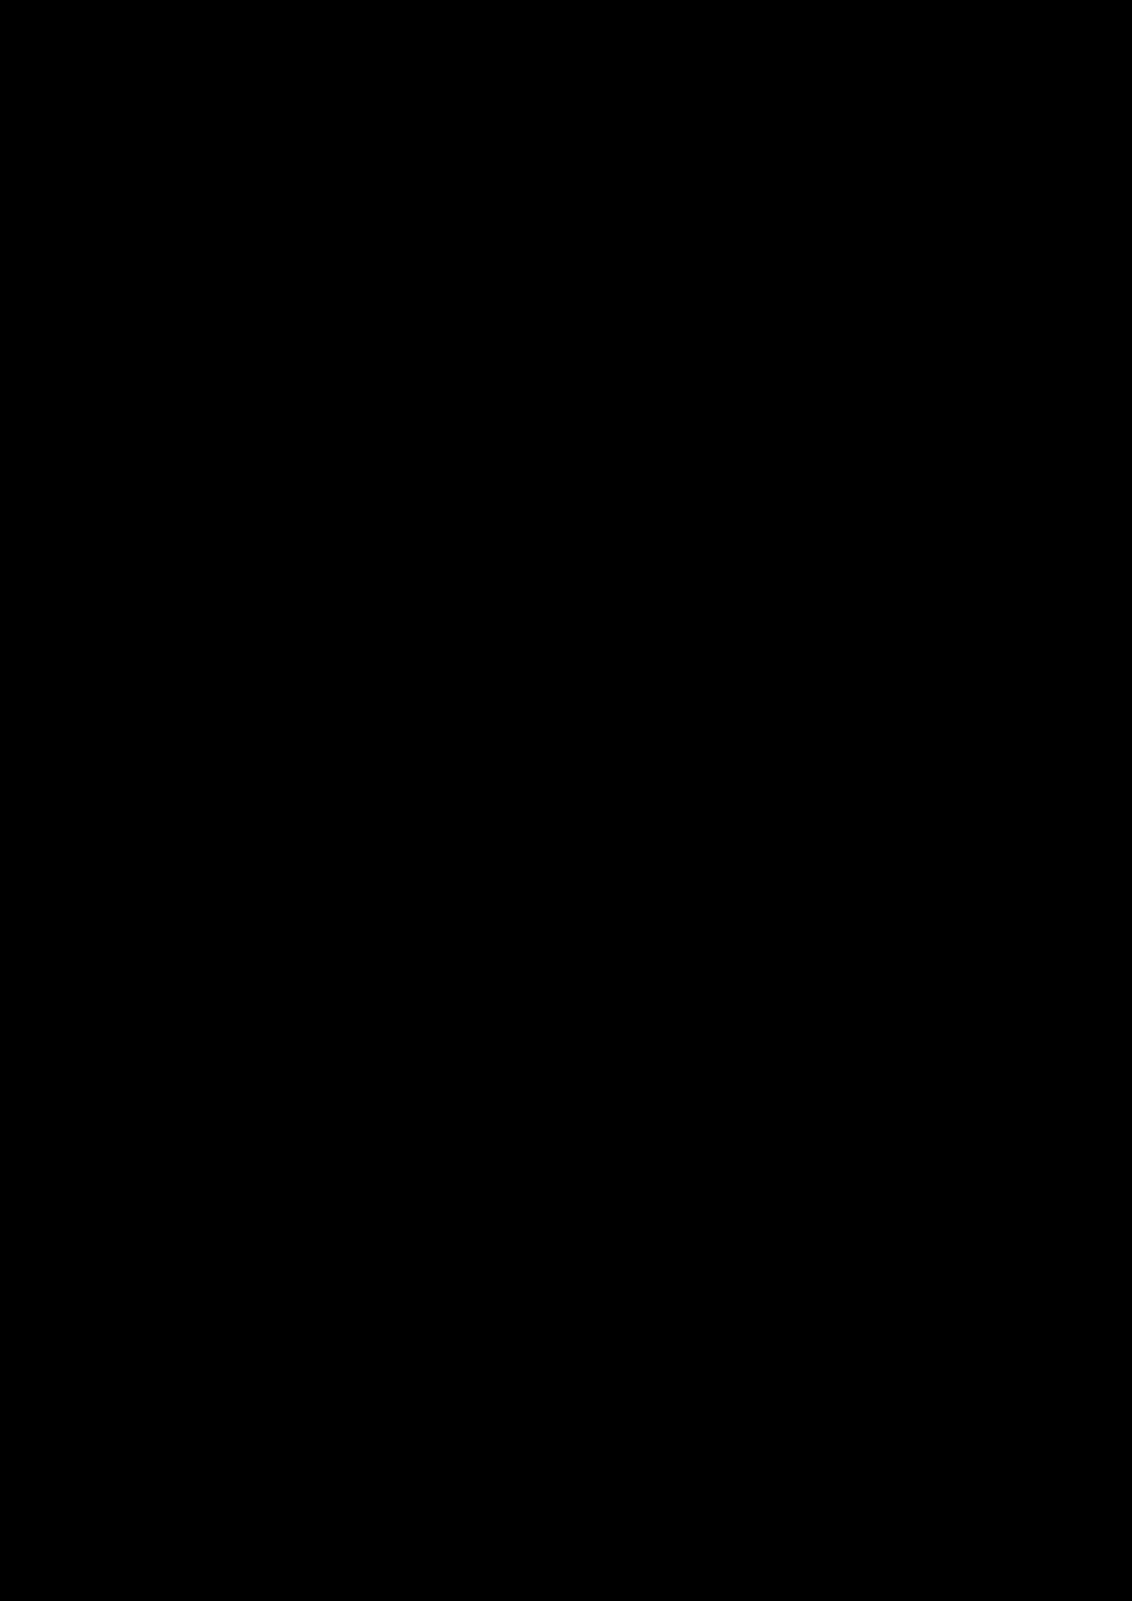 Obryiv slide, Image 3